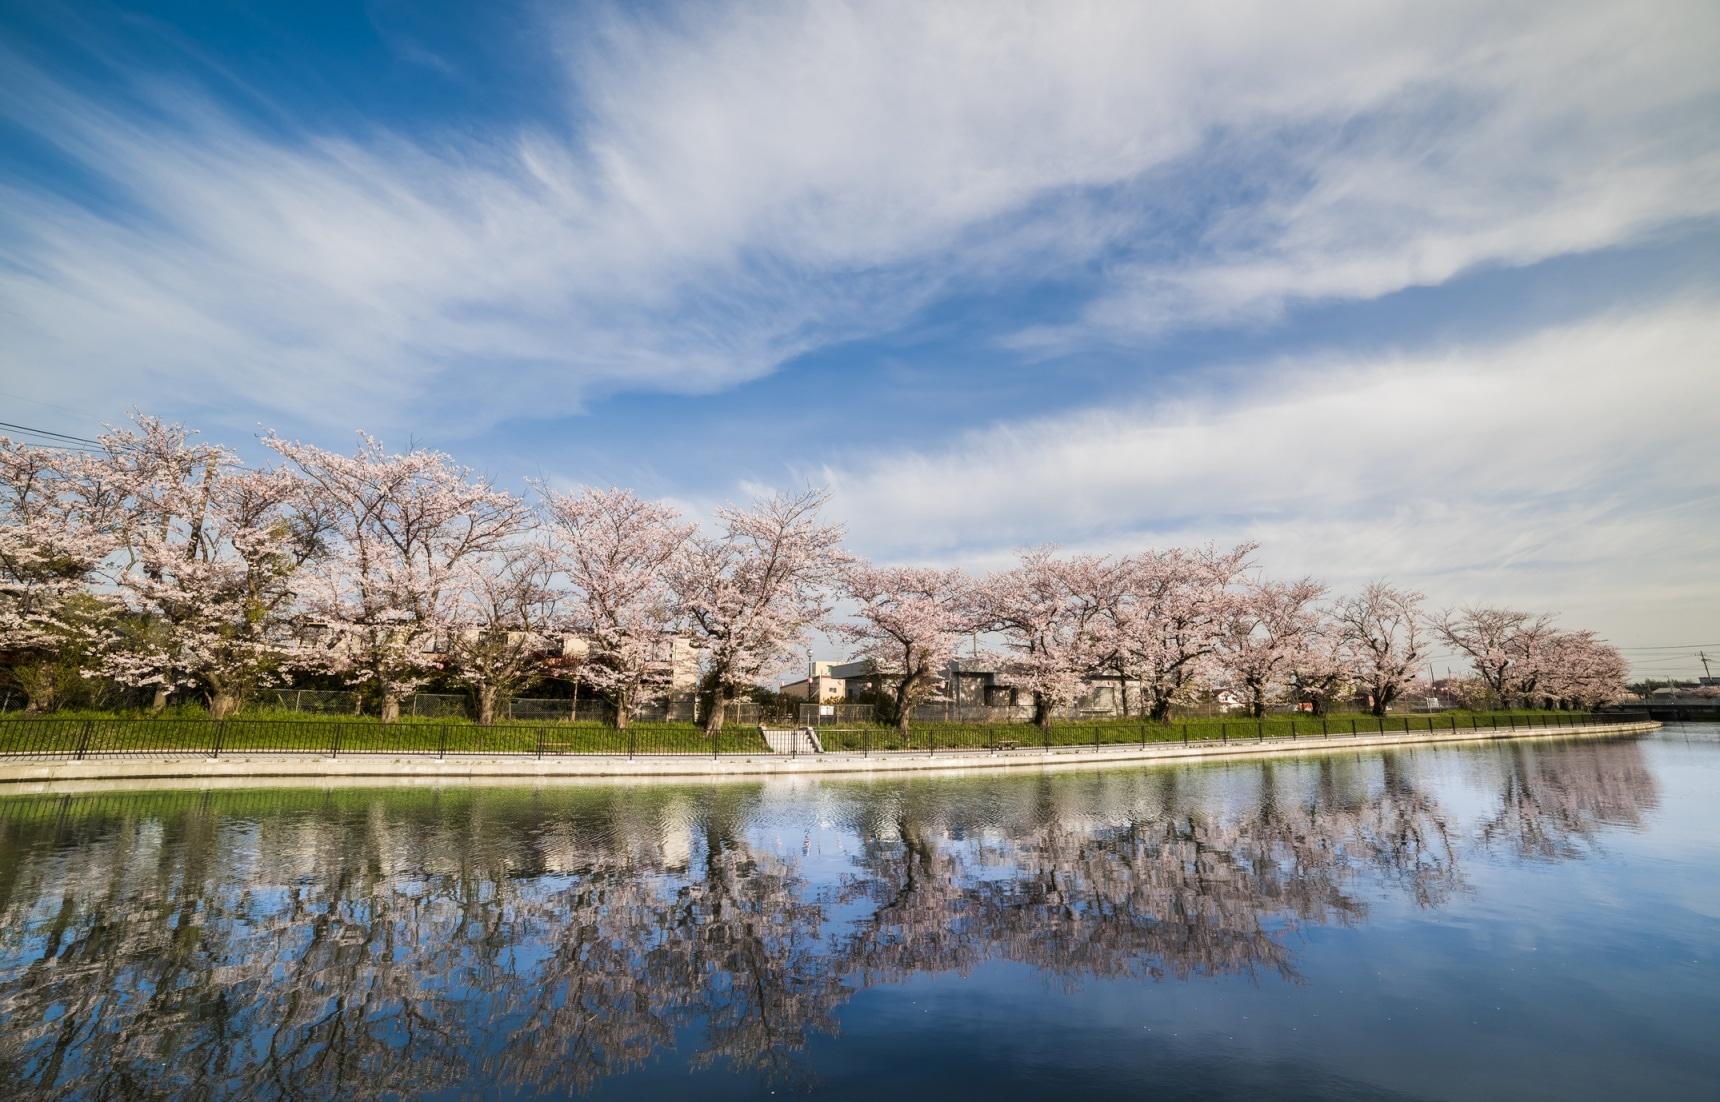 4 Spots for Sakura Along the Water in Tokyo